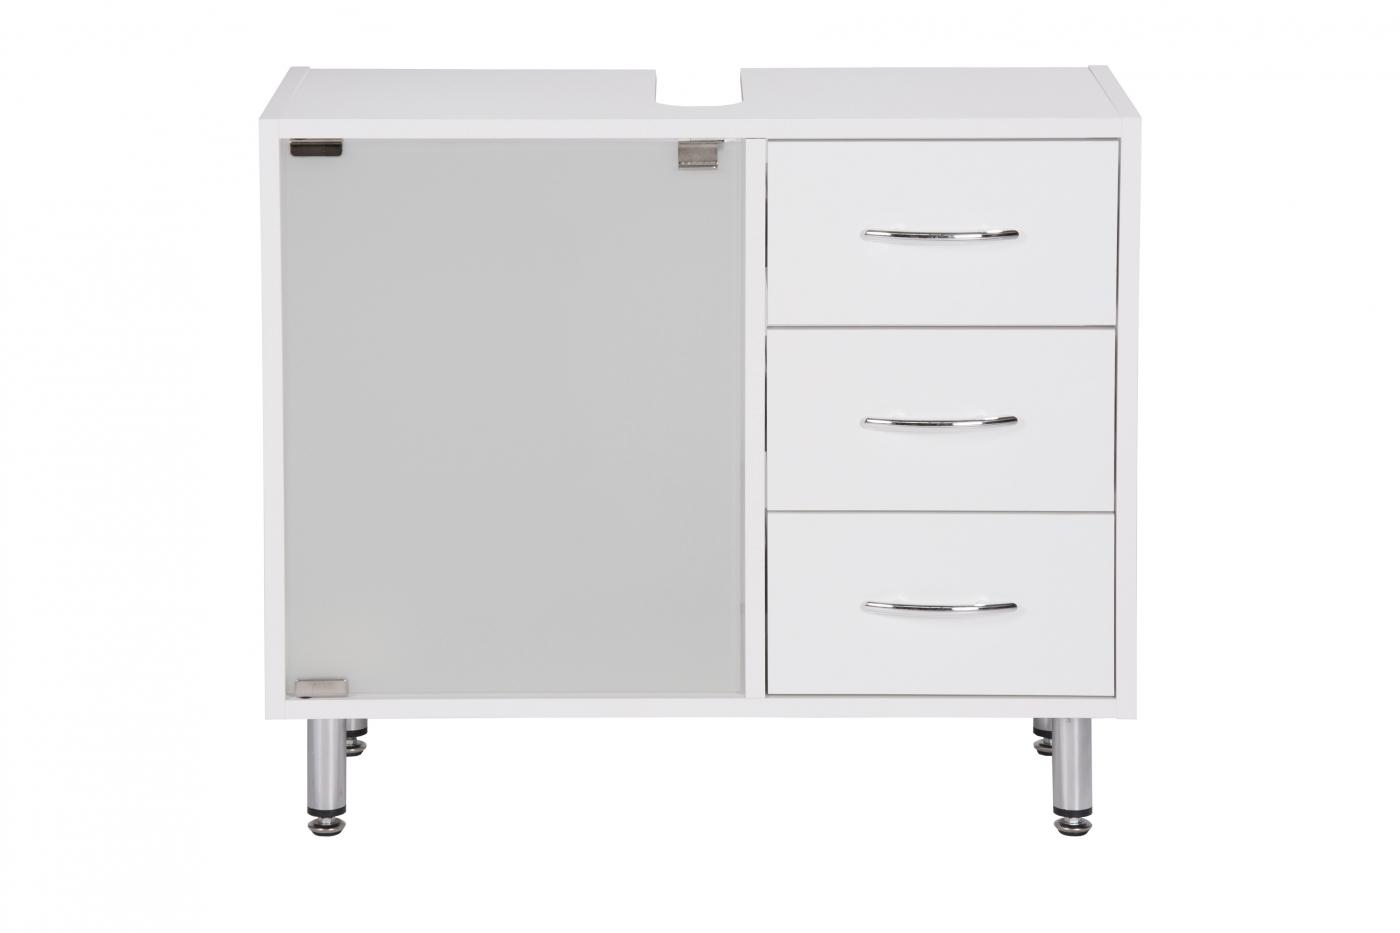 Umyvadlová skříňka Jella, 66 cm, bílá